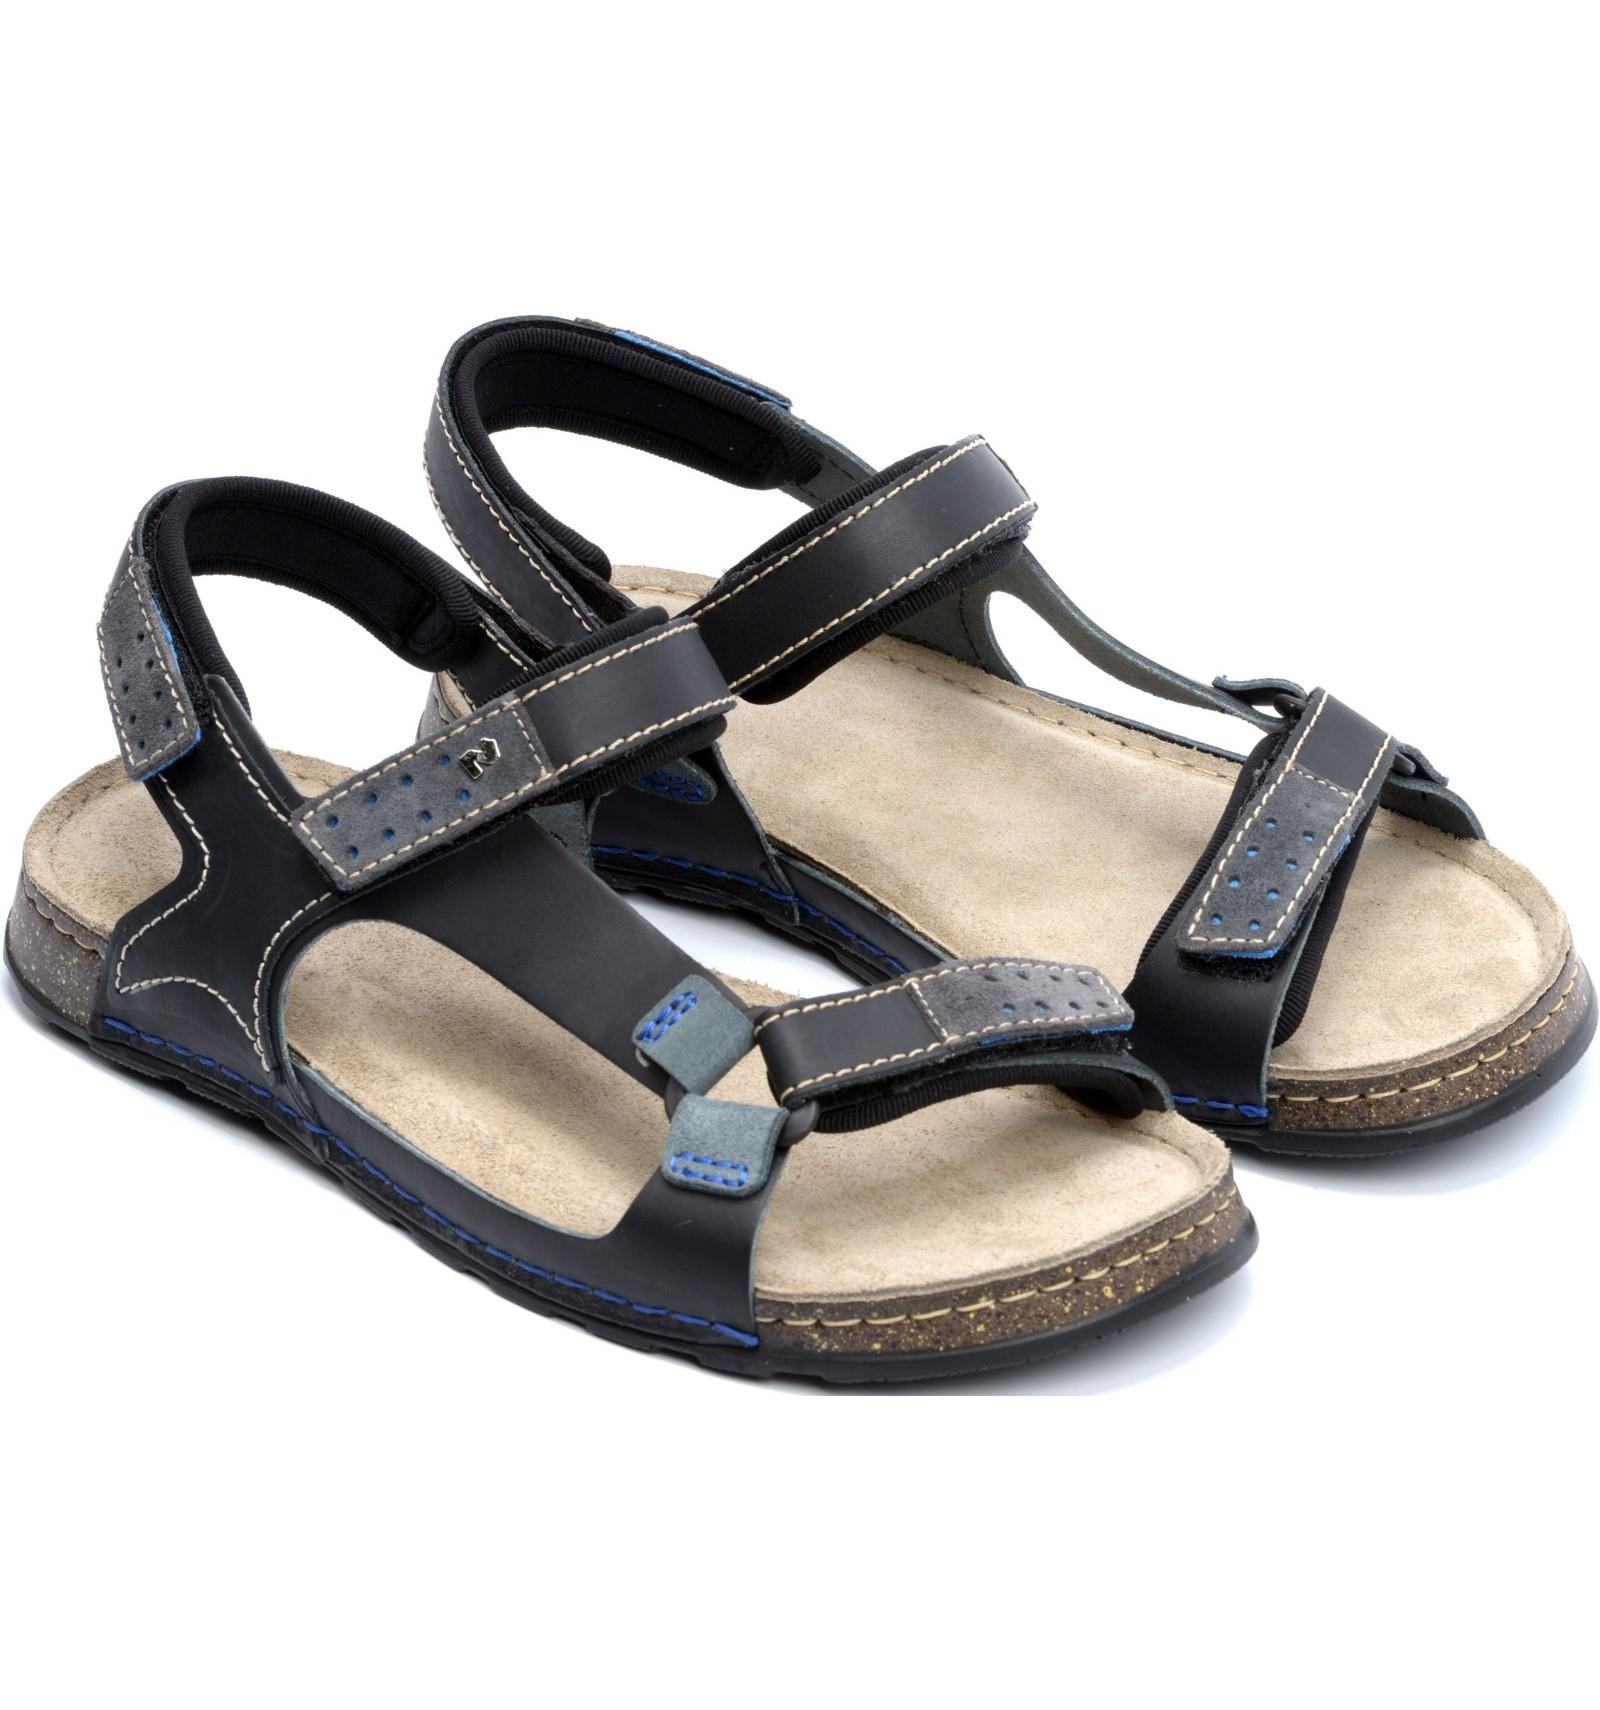 Komfortowe sandały męskie, CZARNO SZARE, naturalna skóra